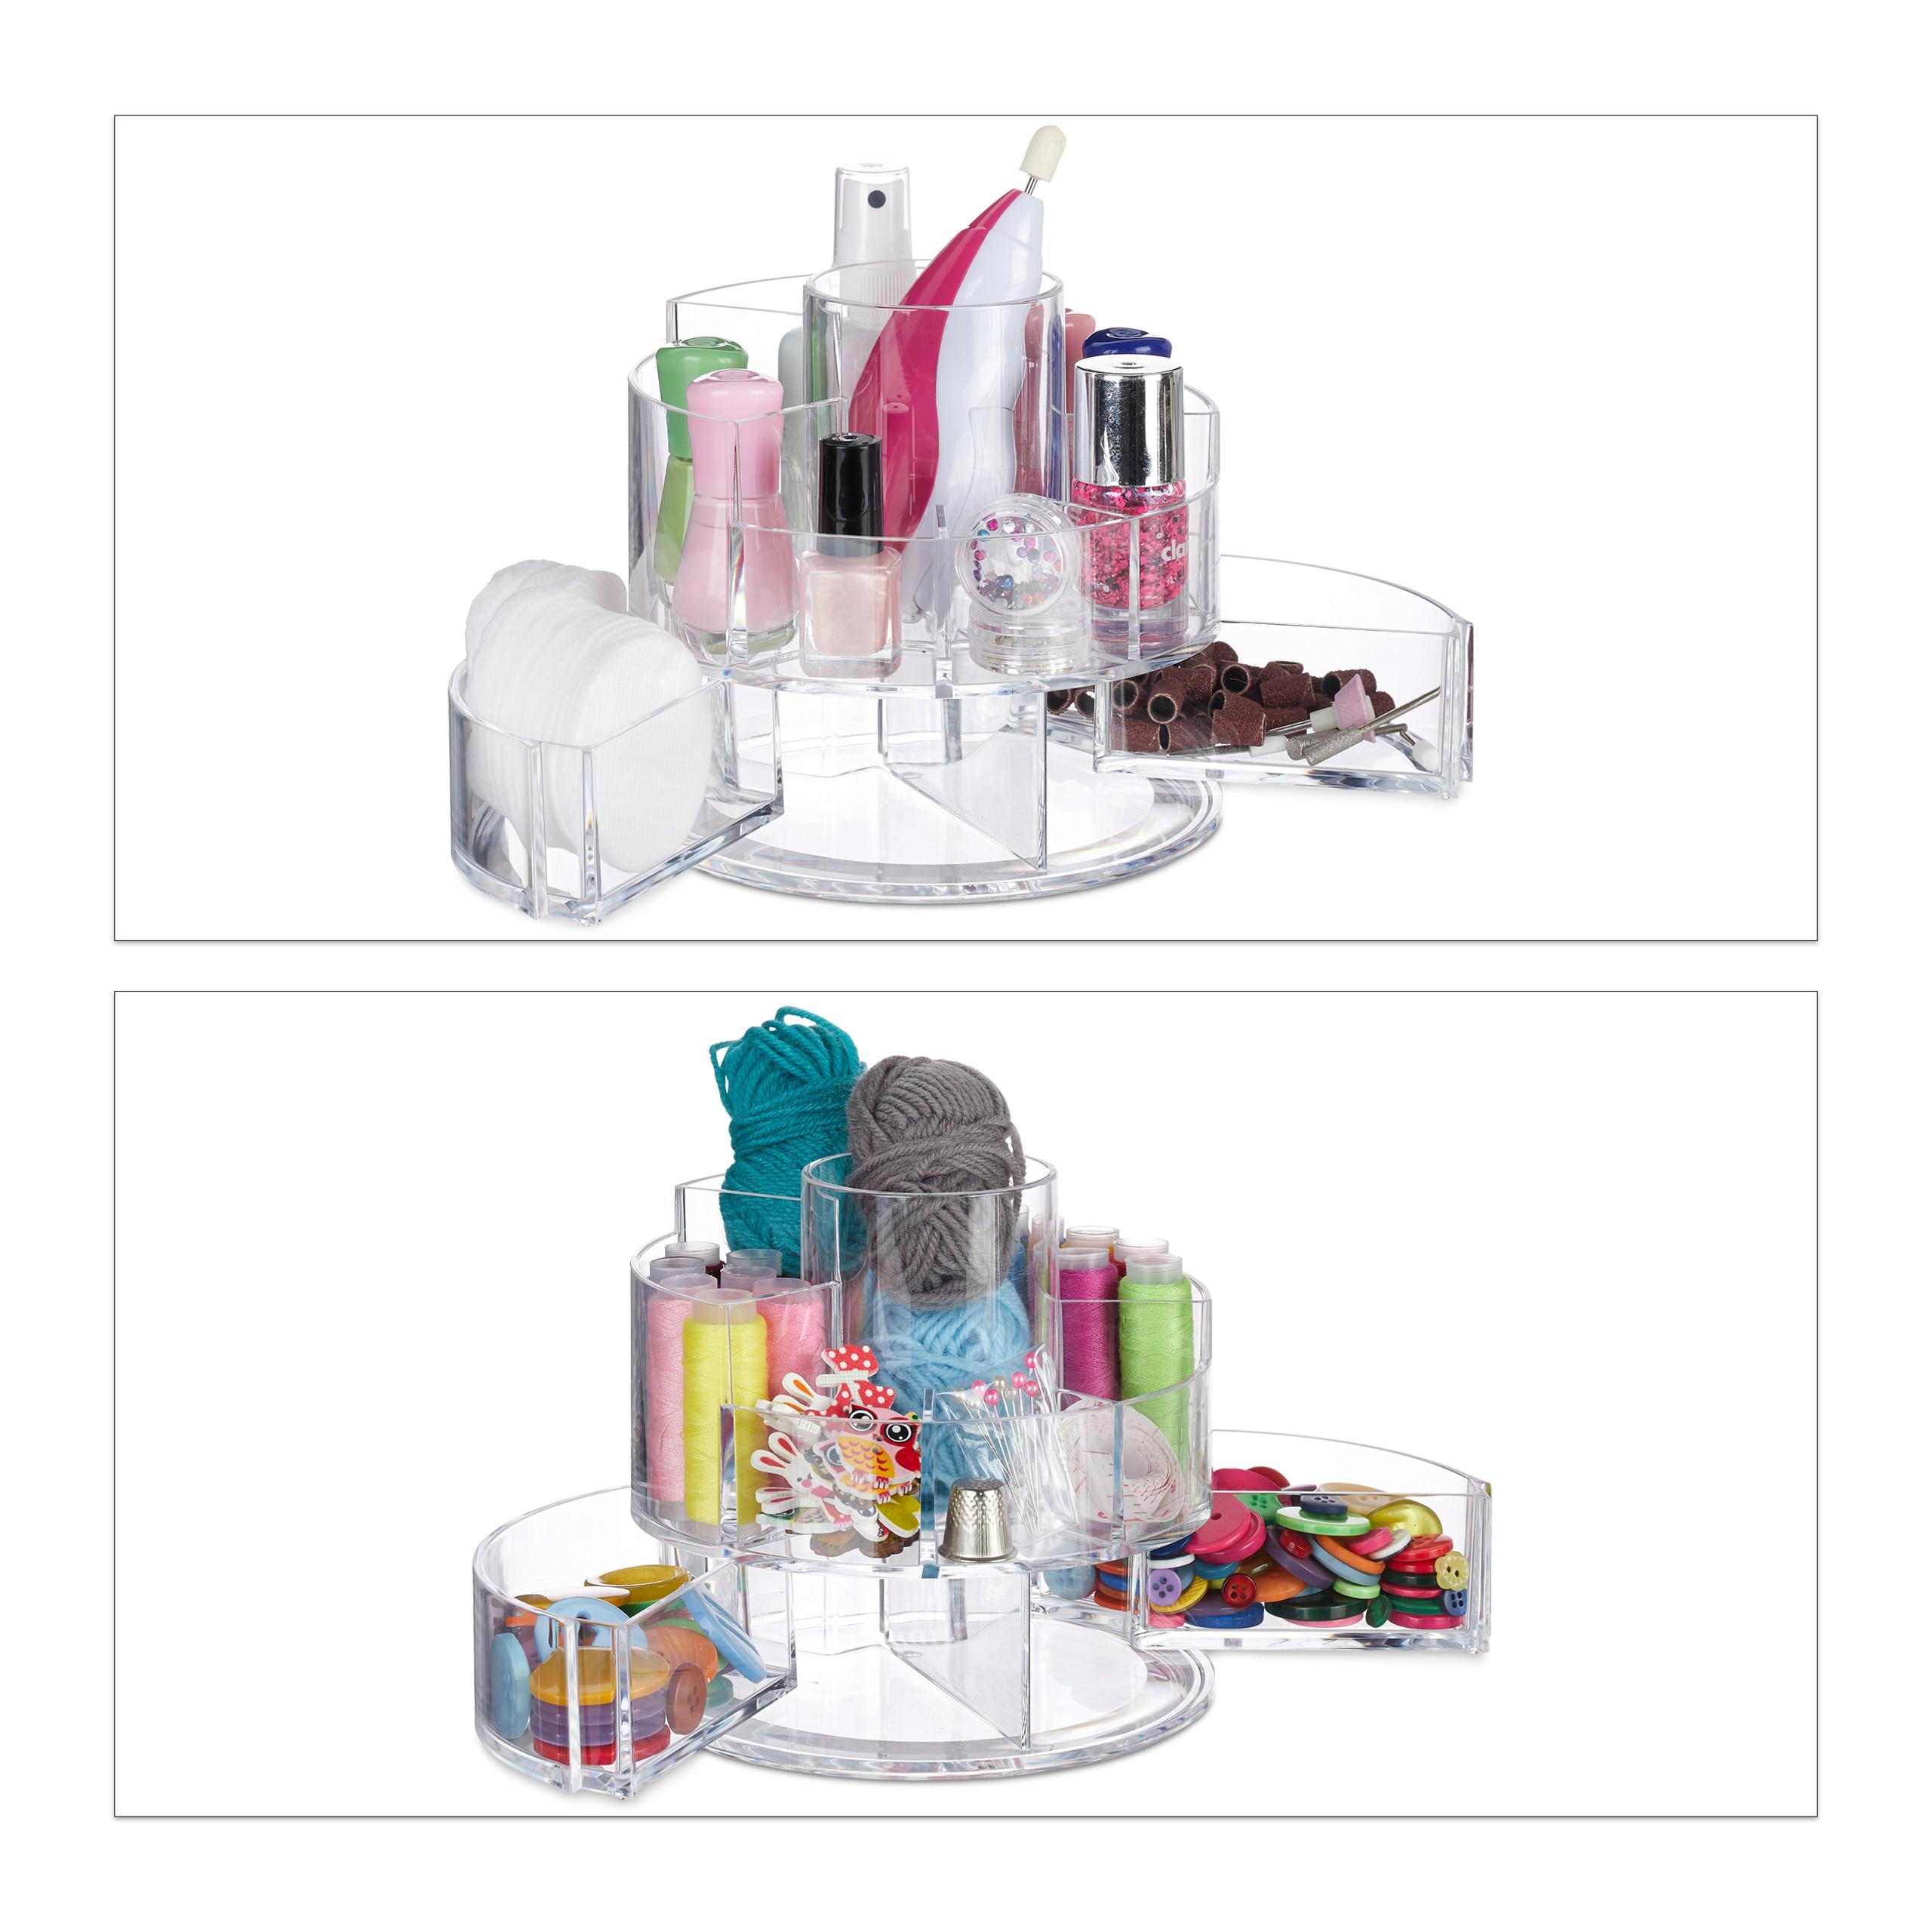 make-up-organizer-acryl-rond-cosmetica-opbergen-opbergsysteem miniatuur 10